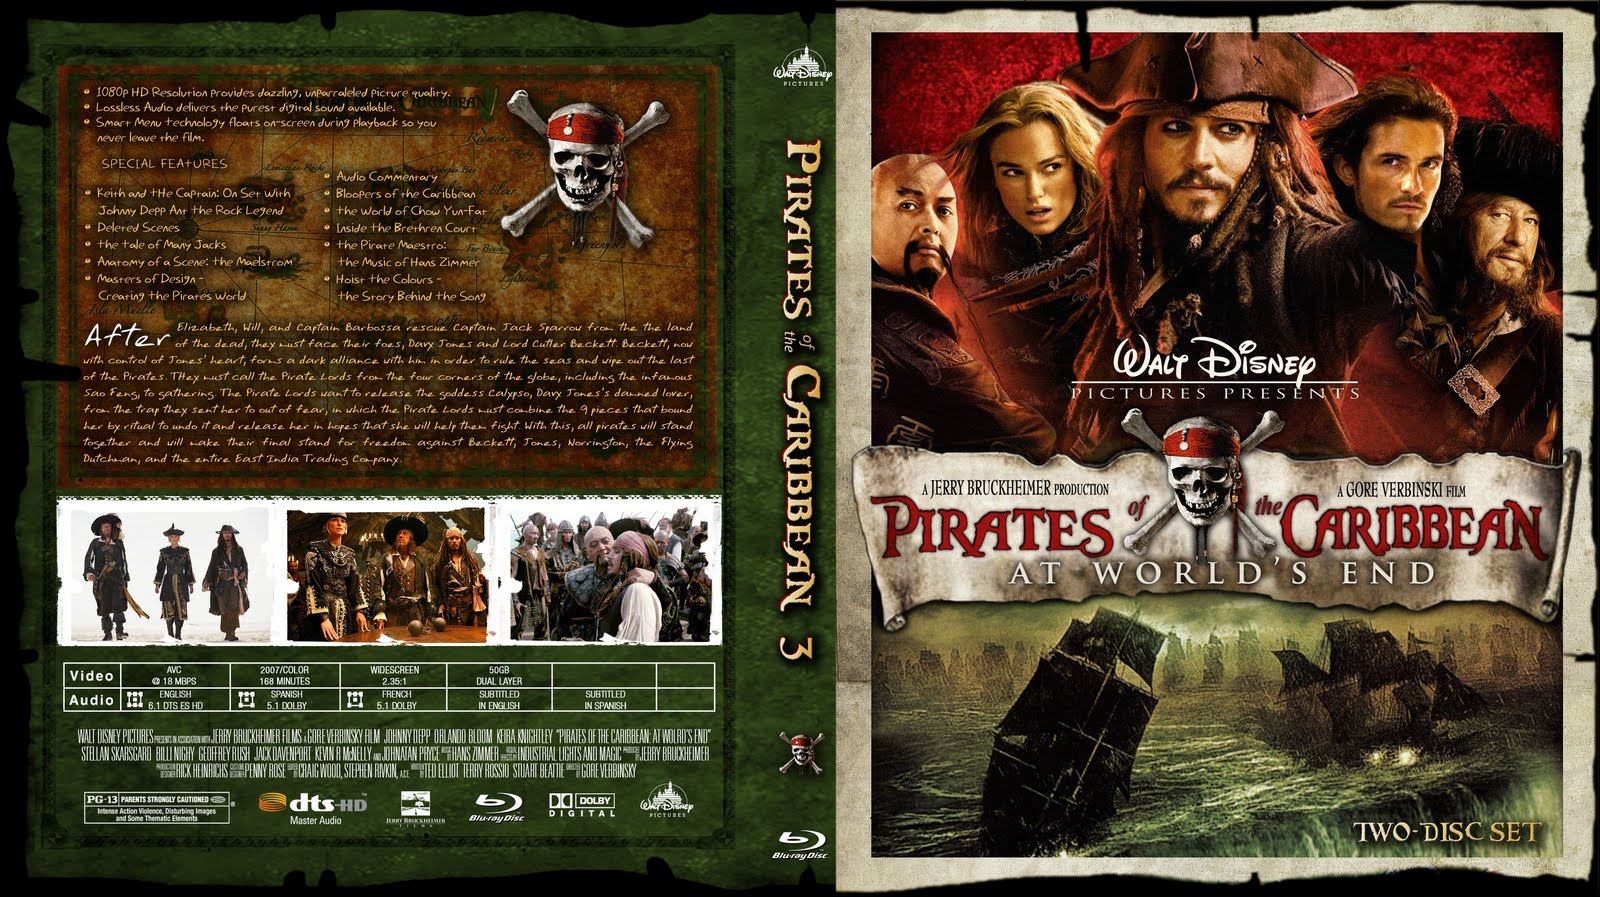 Amazoncom Pirates of the Caribbean Dead Men Tell No